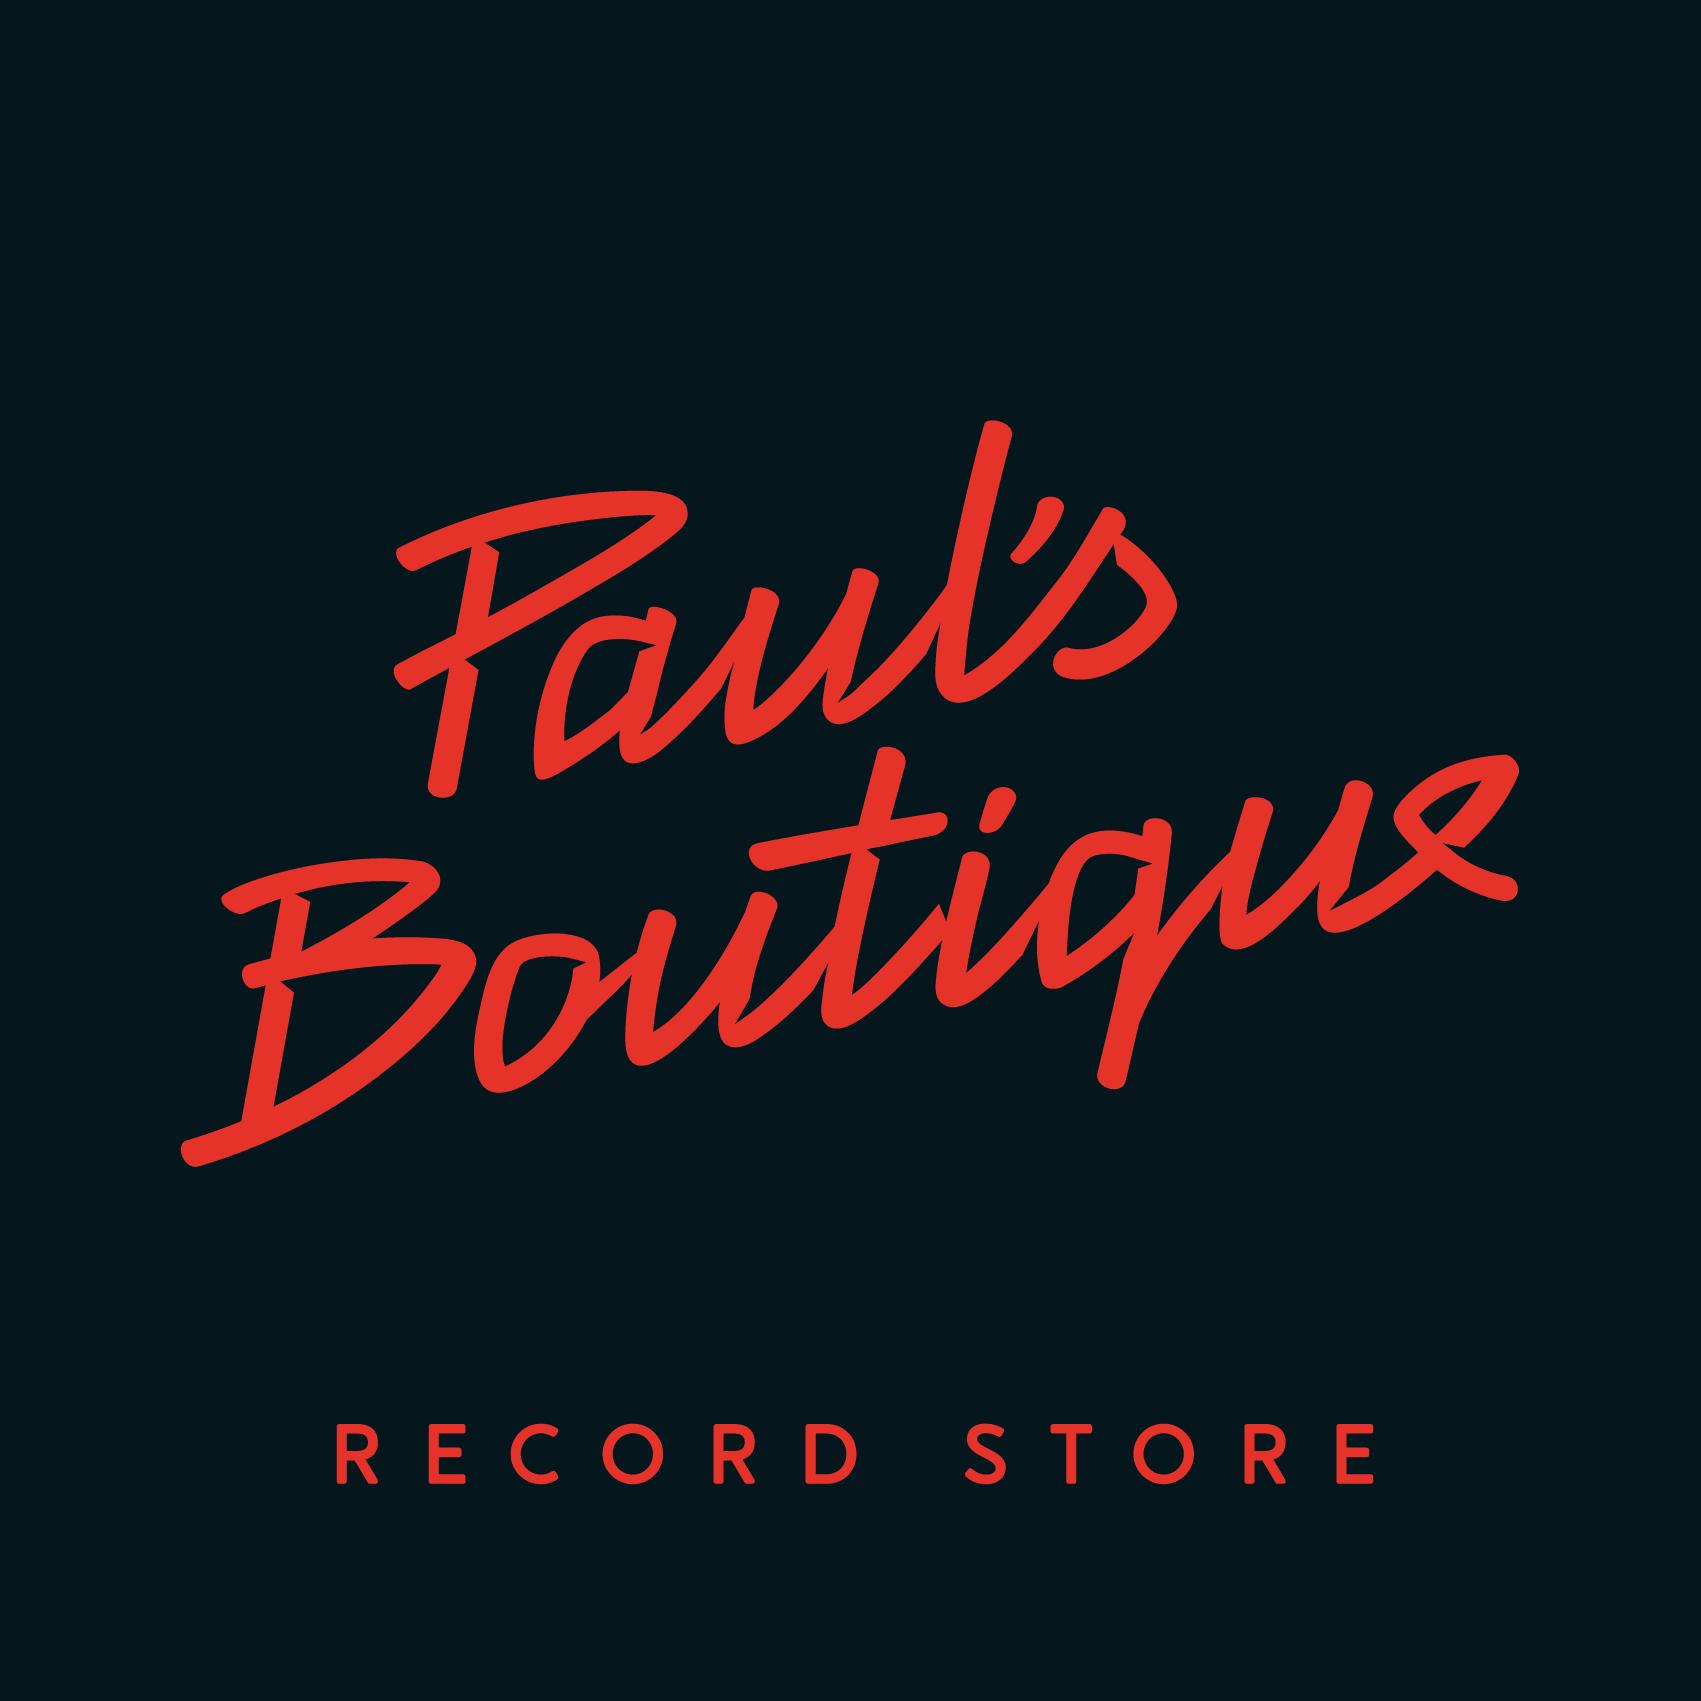 Paul's Boutique Record Store logo